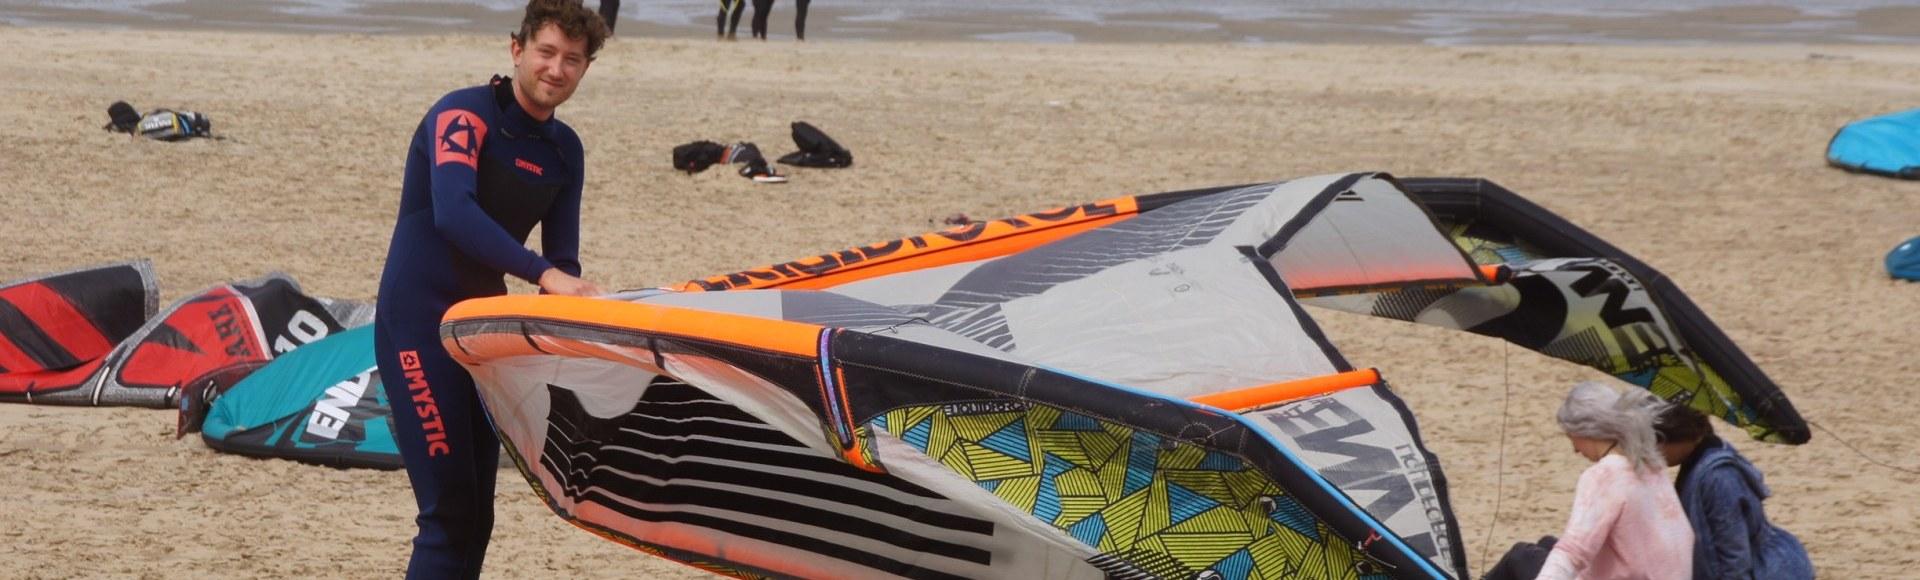 Kite gear stalling Bloemendaal